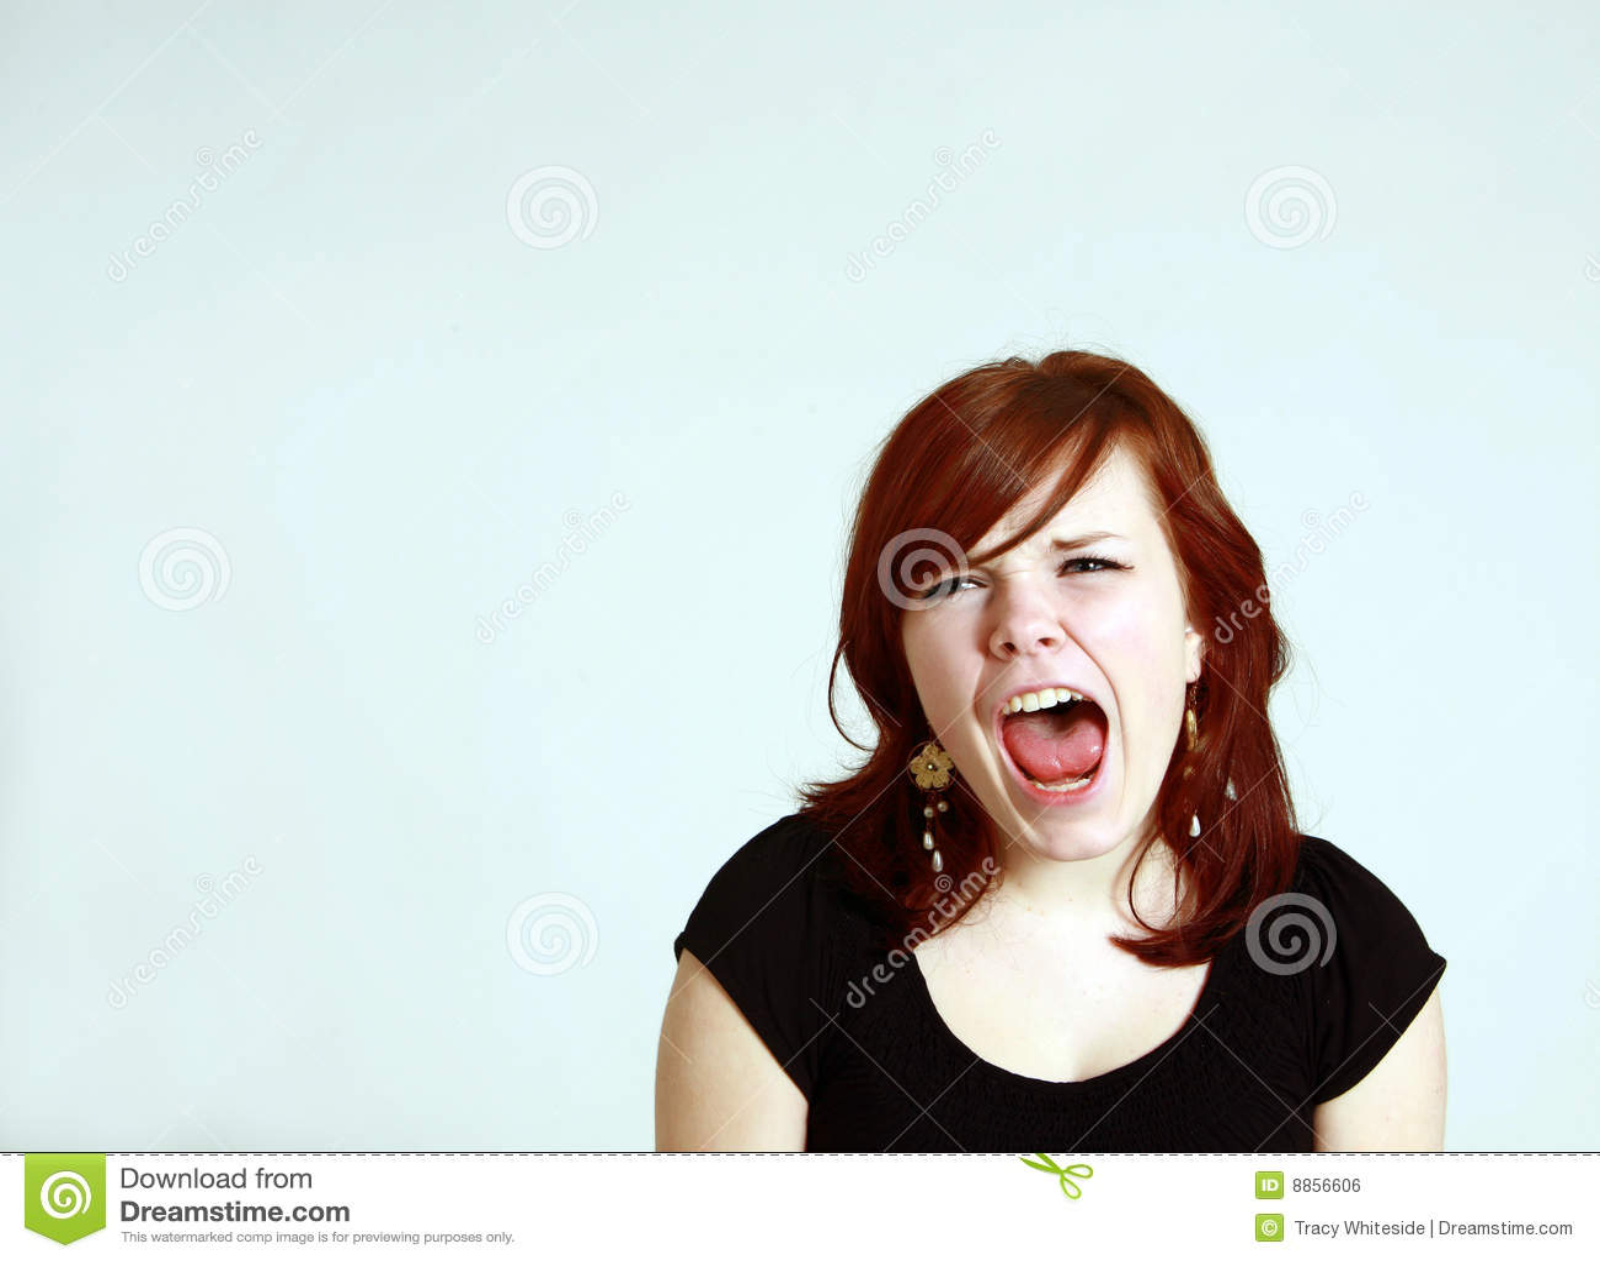 Teen girl screaming